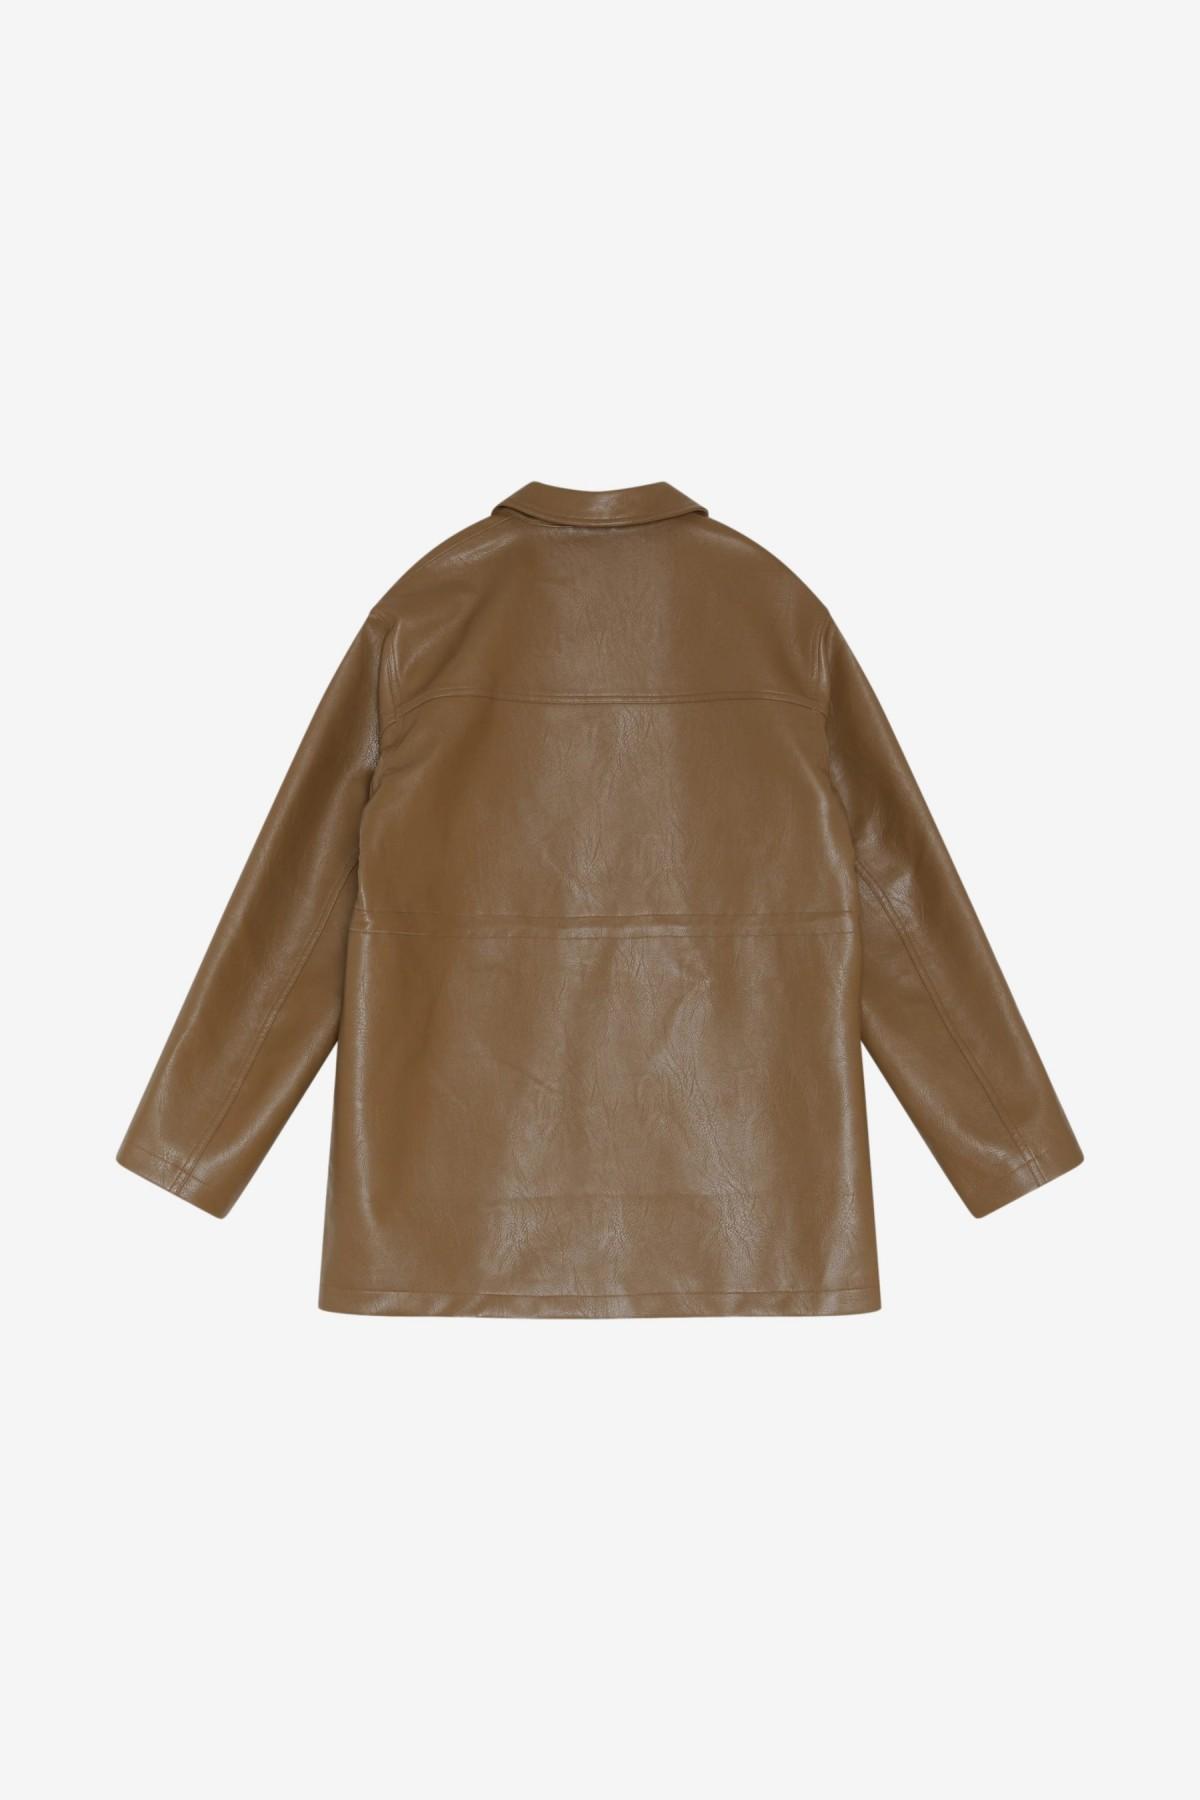 Han Kjøbenhavn Desk Jacket in Brown Vegan Leather